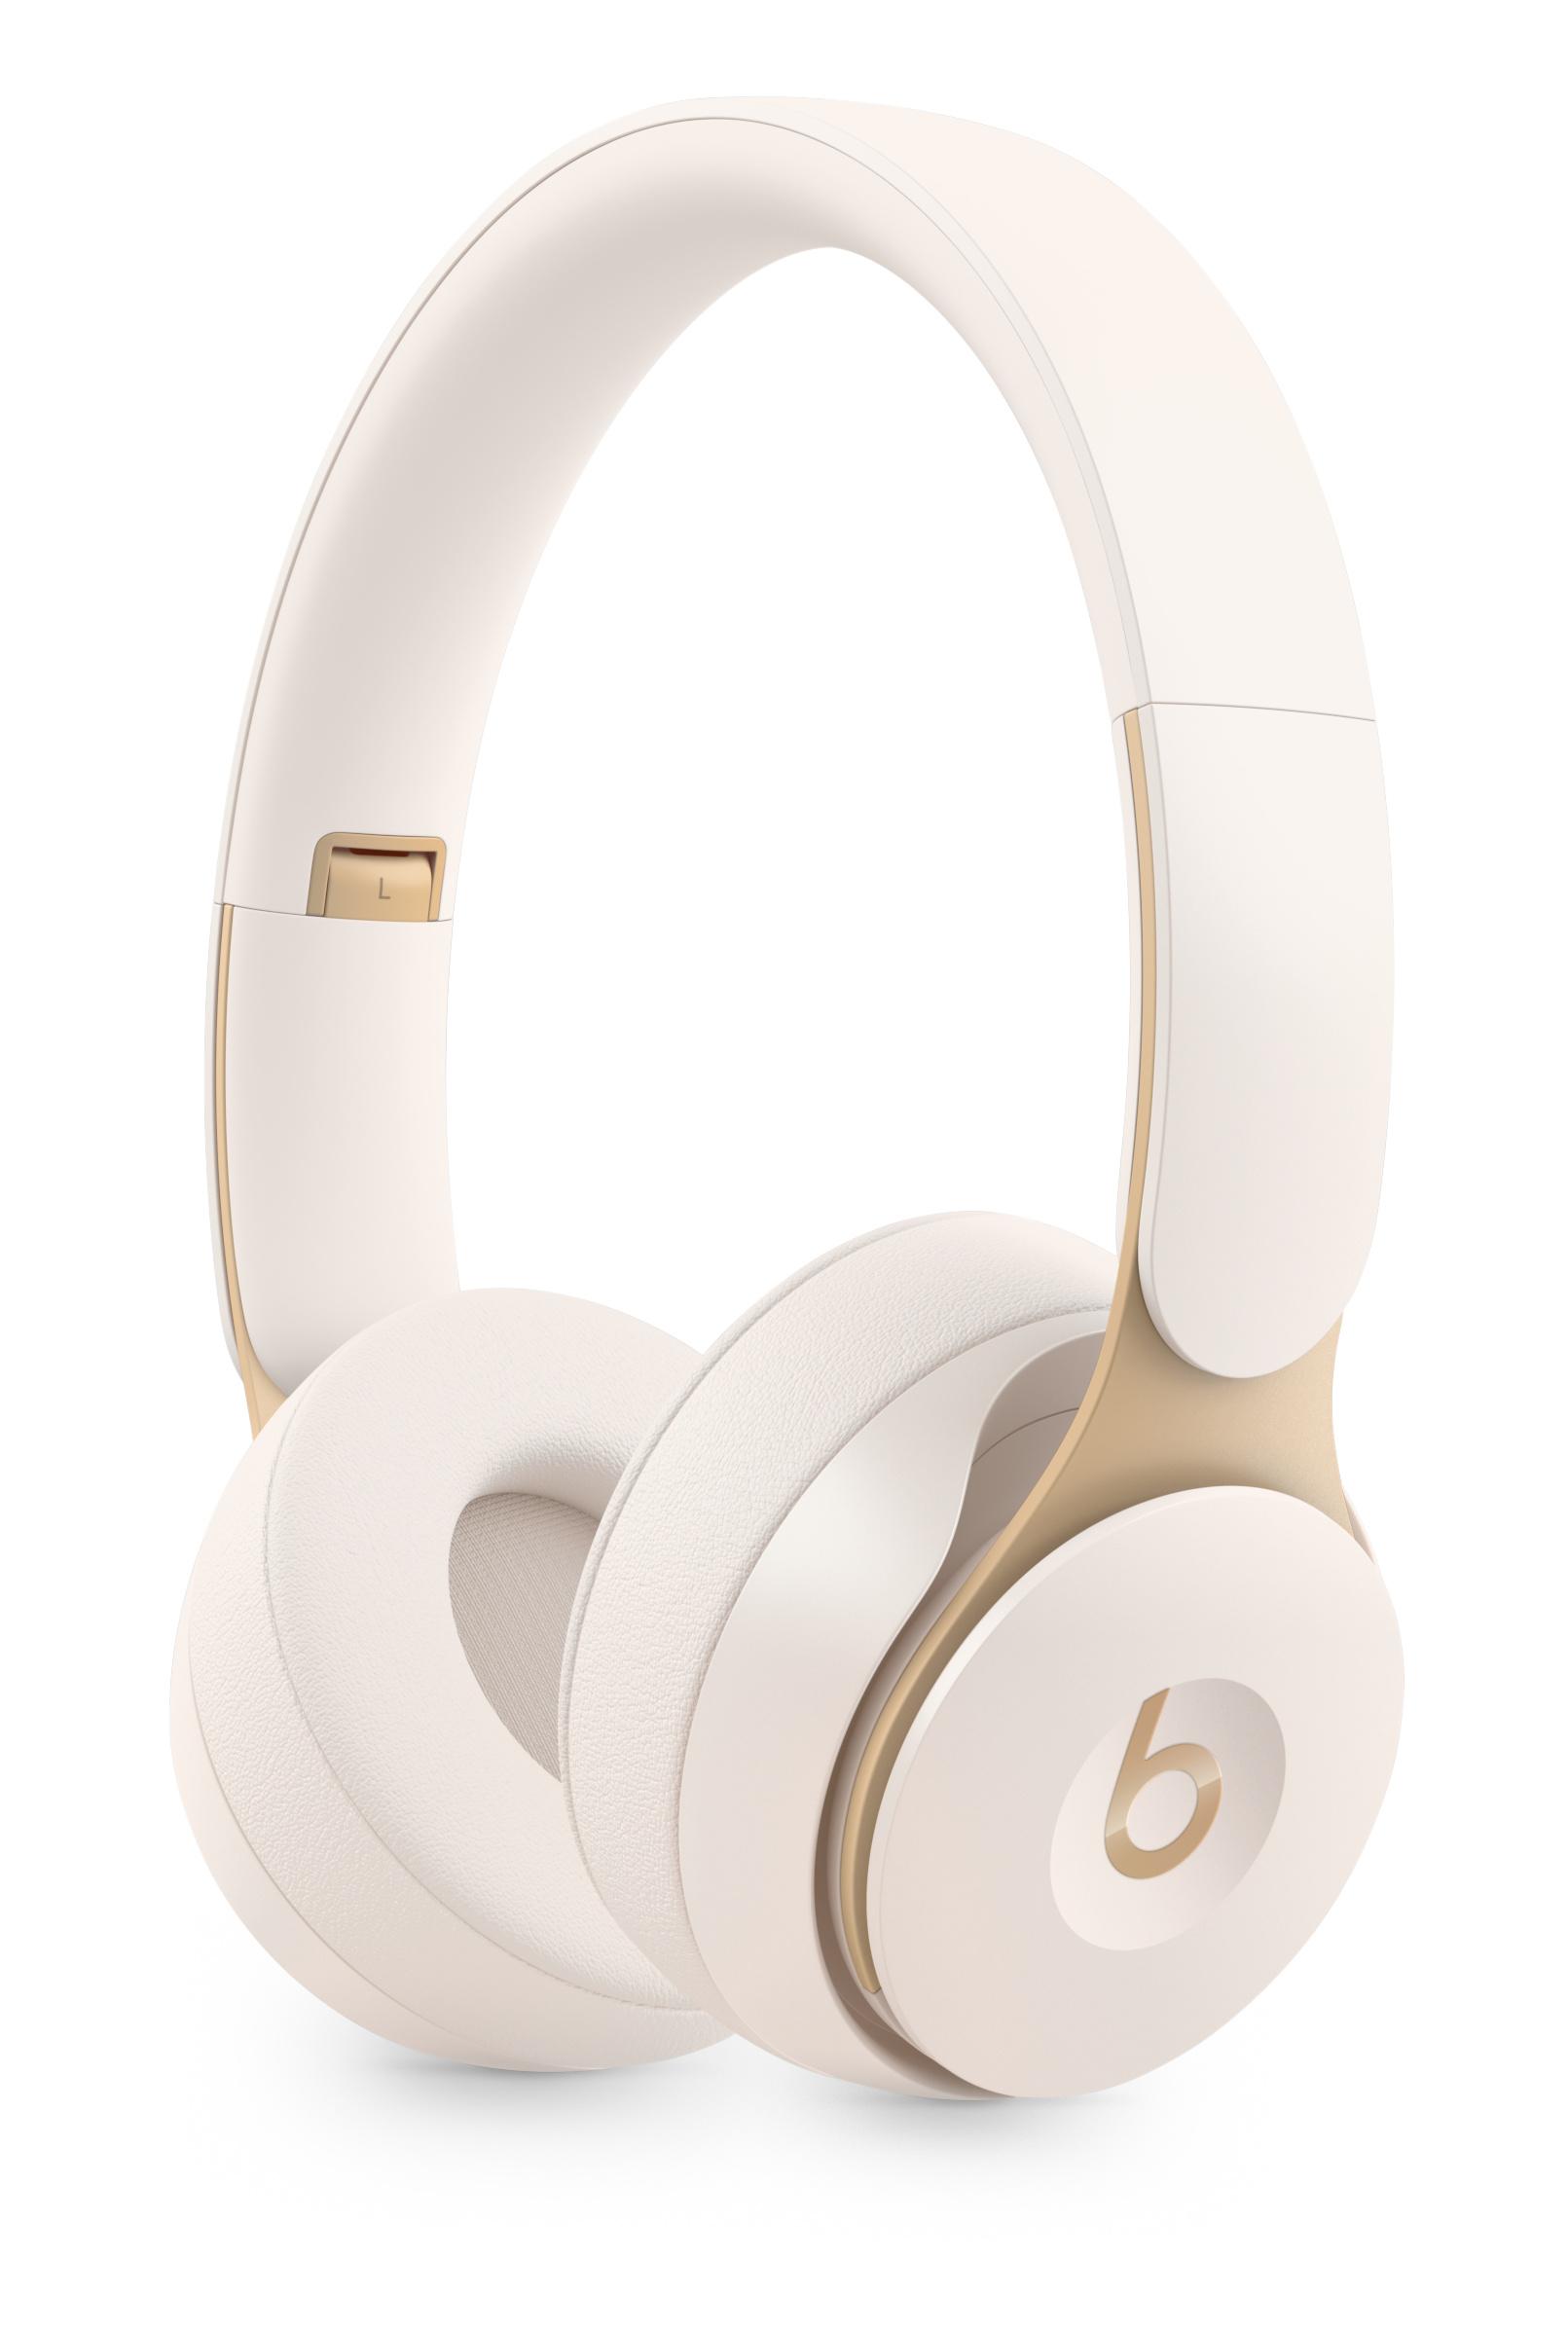 Fone de Ouvido Solo Pro Wireless Beats Mrj72be/a